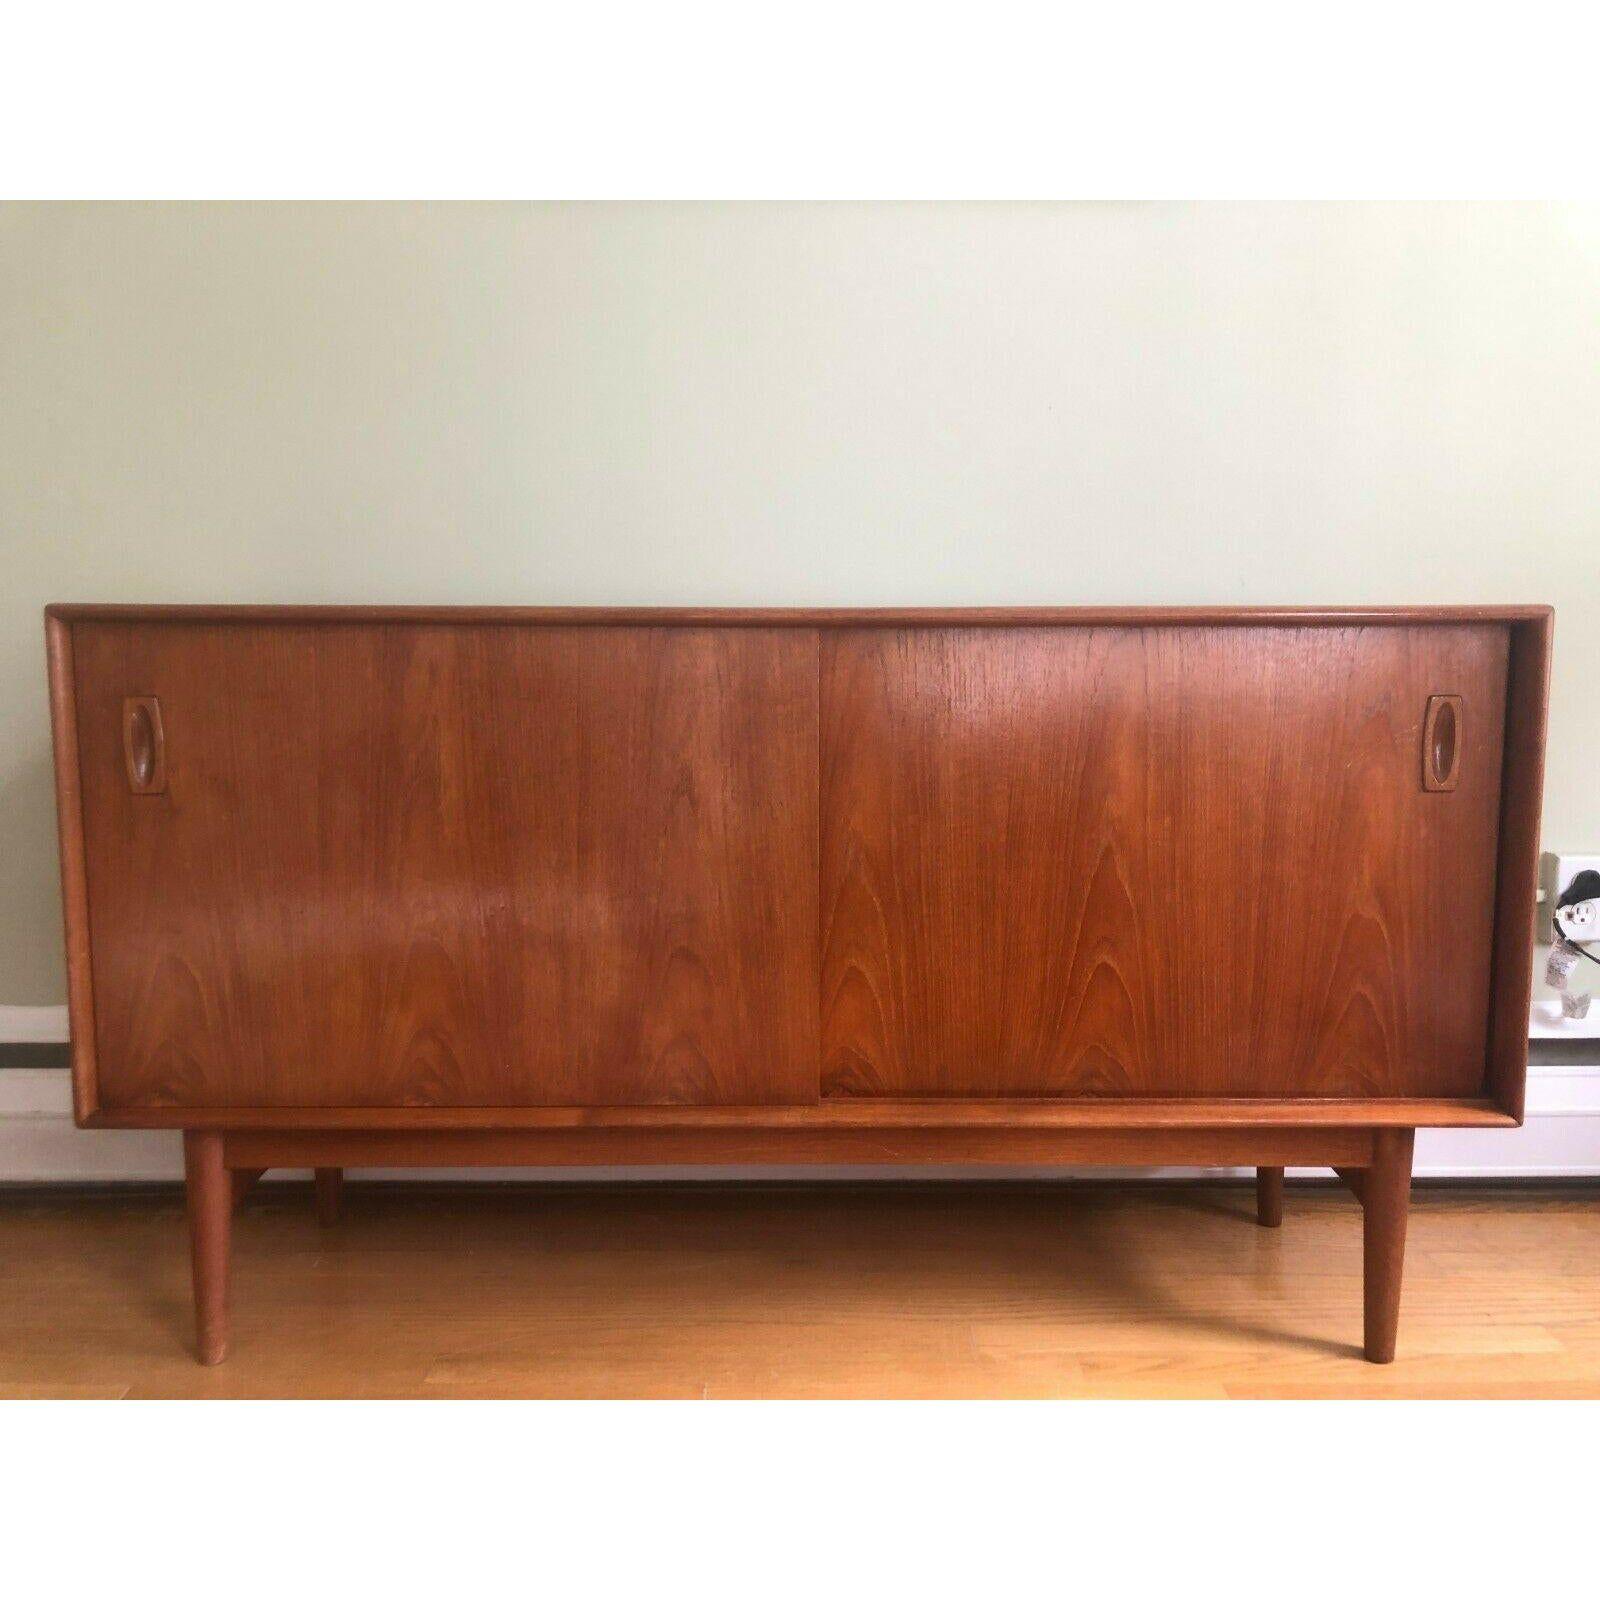 1950s Arne Hovmand Olsen Compact Teak Danish Modern Credenza Cabinet Sideboard Chairish In 2020 Danish Modern Credenza Danish Modern Furniture Sideboard Cabinet